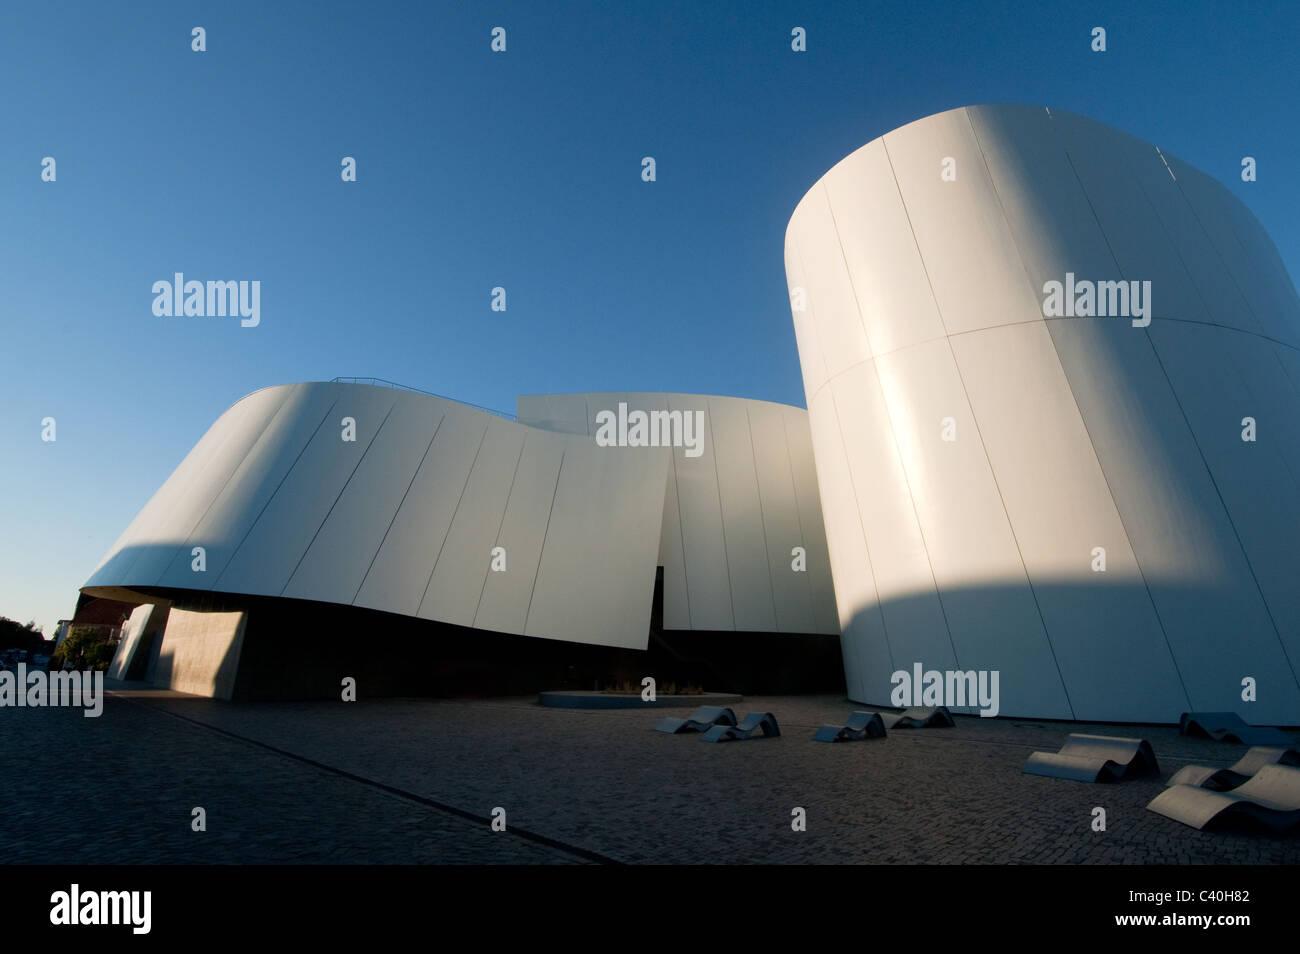 The new Ozeaneum Public Aquarium, in Stralsund harbour, Baltic Sea, Mecklenburg-Western Pomerania, Germany, Europe - Stock Image